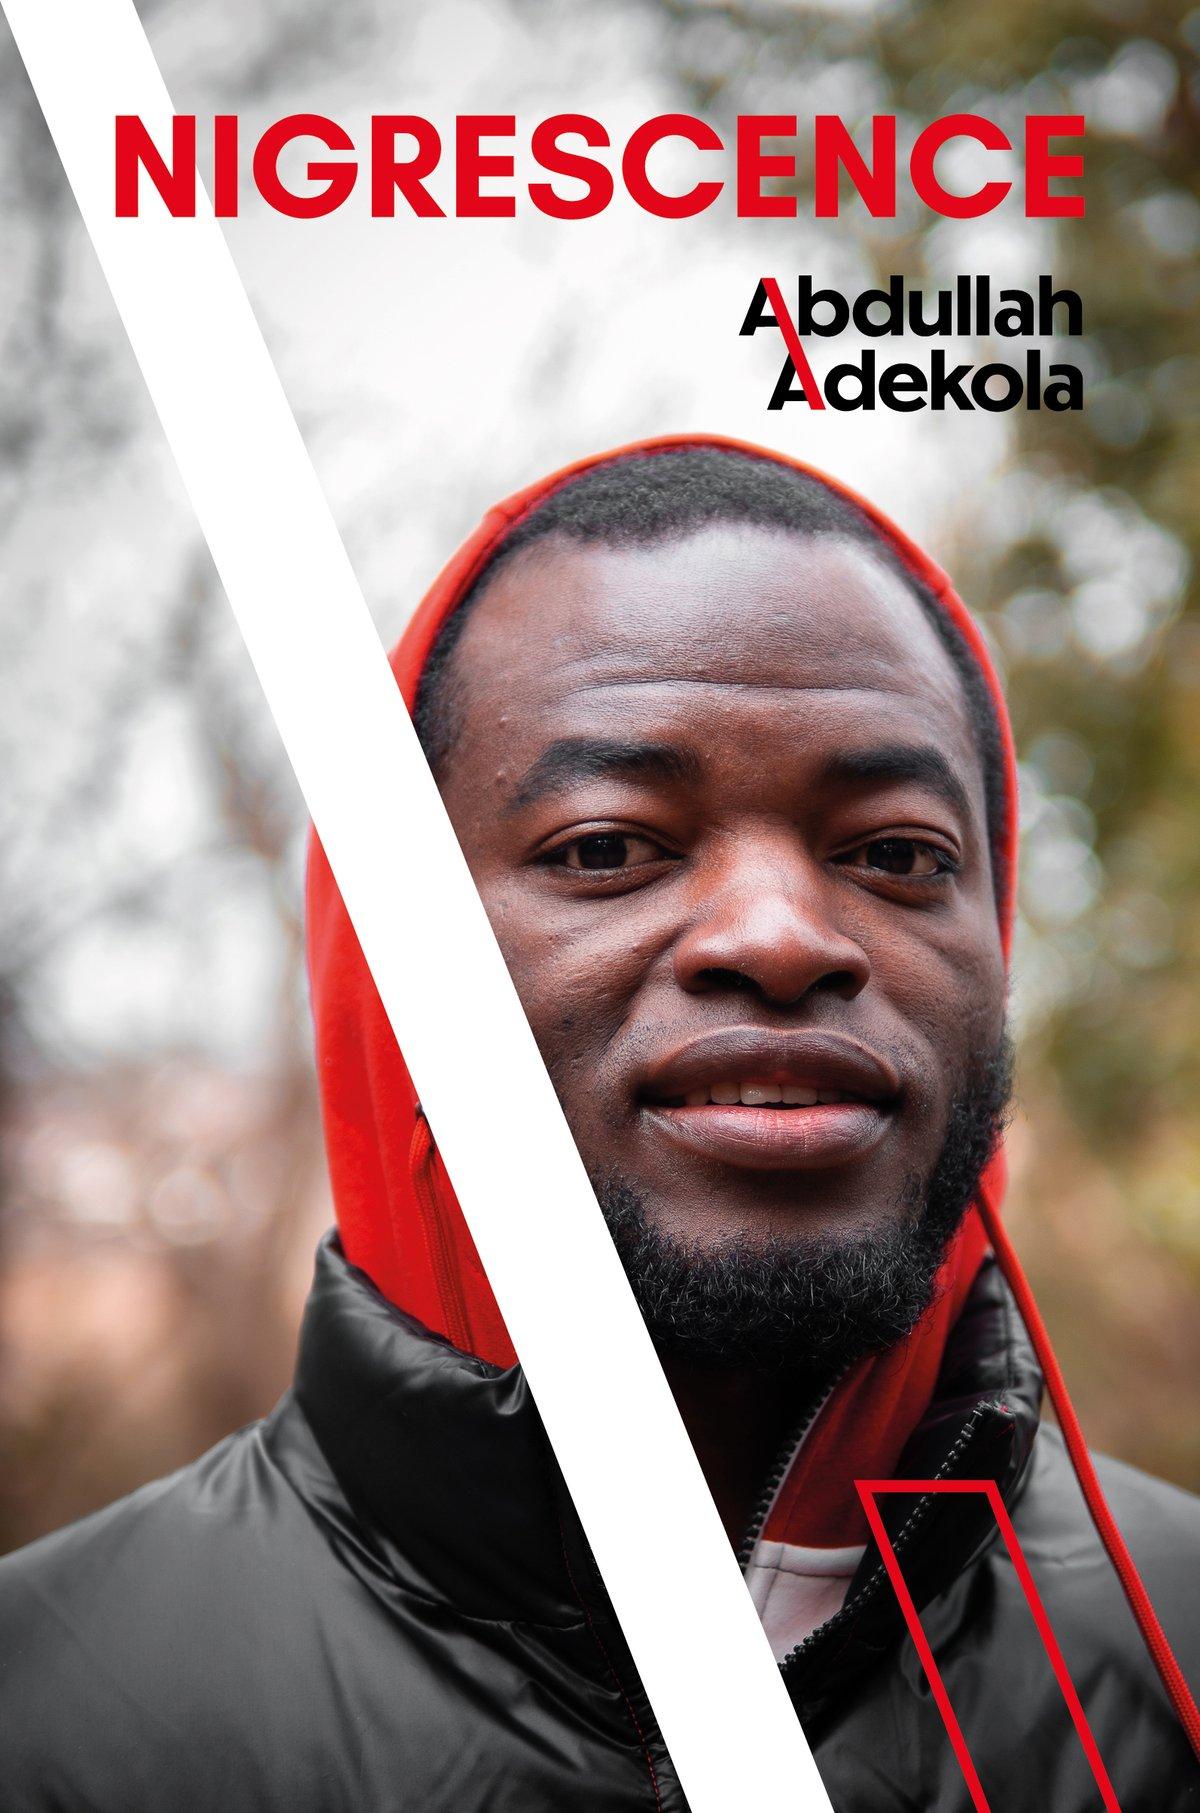 Image of Nigrescence by Abdullah Adekola